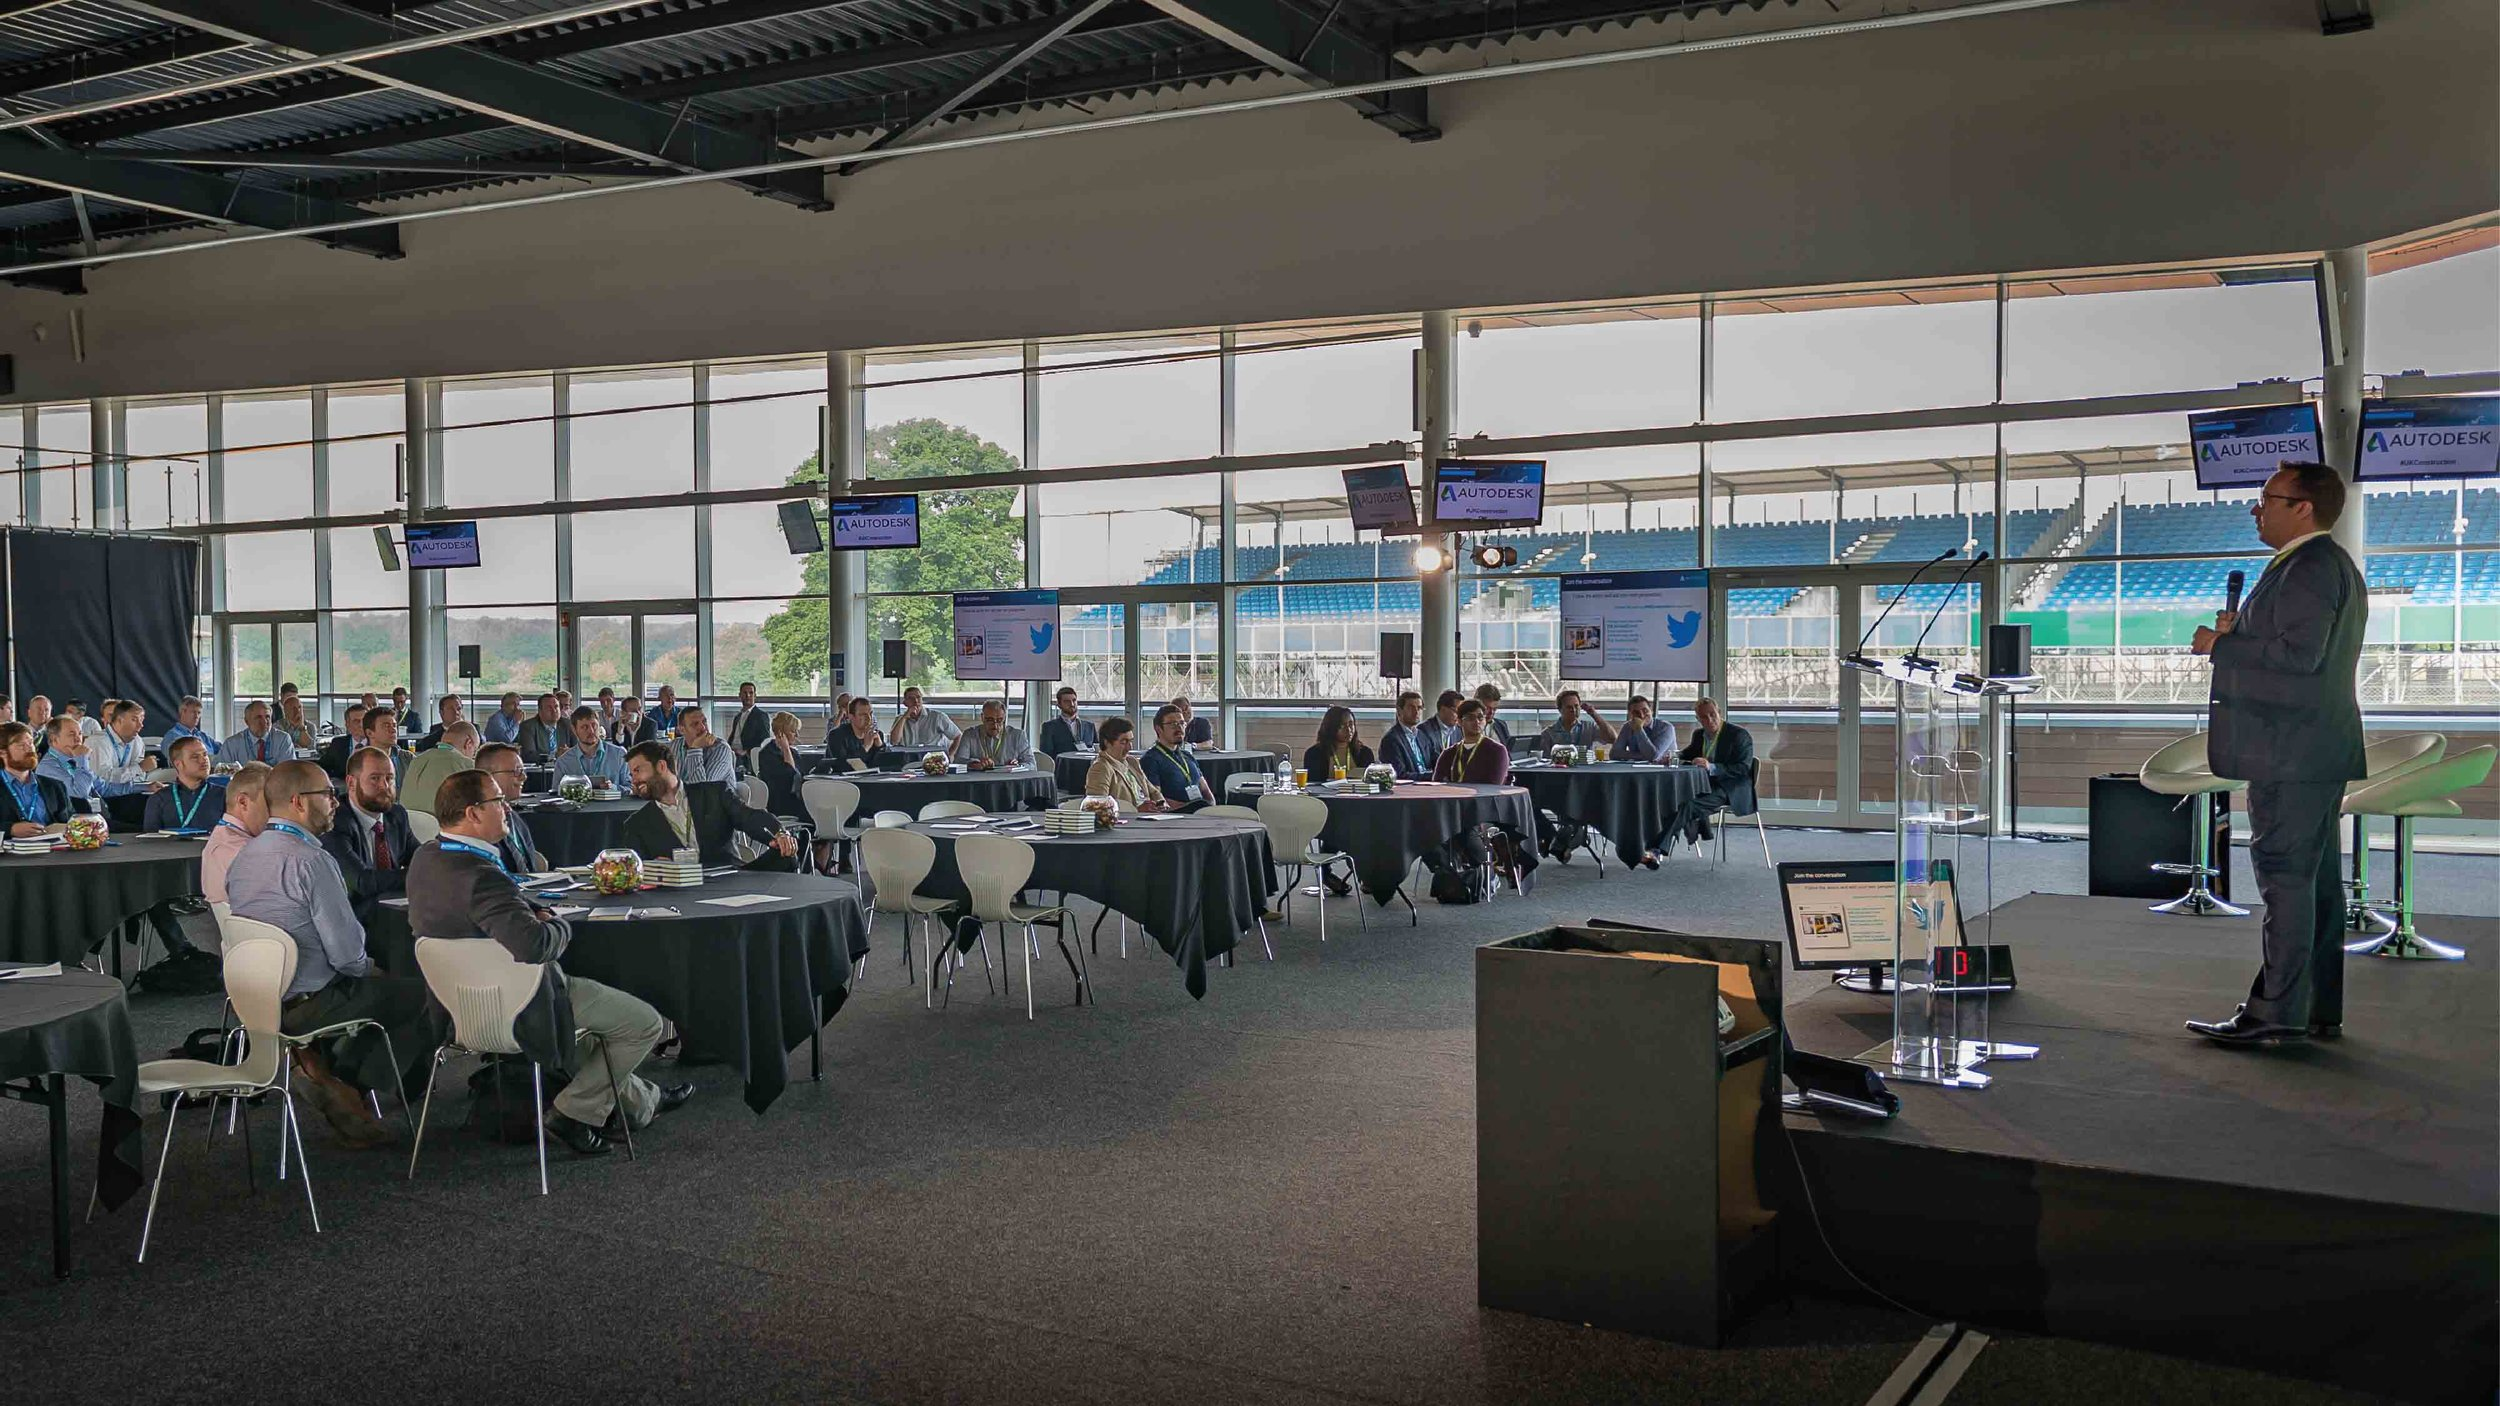 Autodesk Construction Event UK 2016-23.jpg